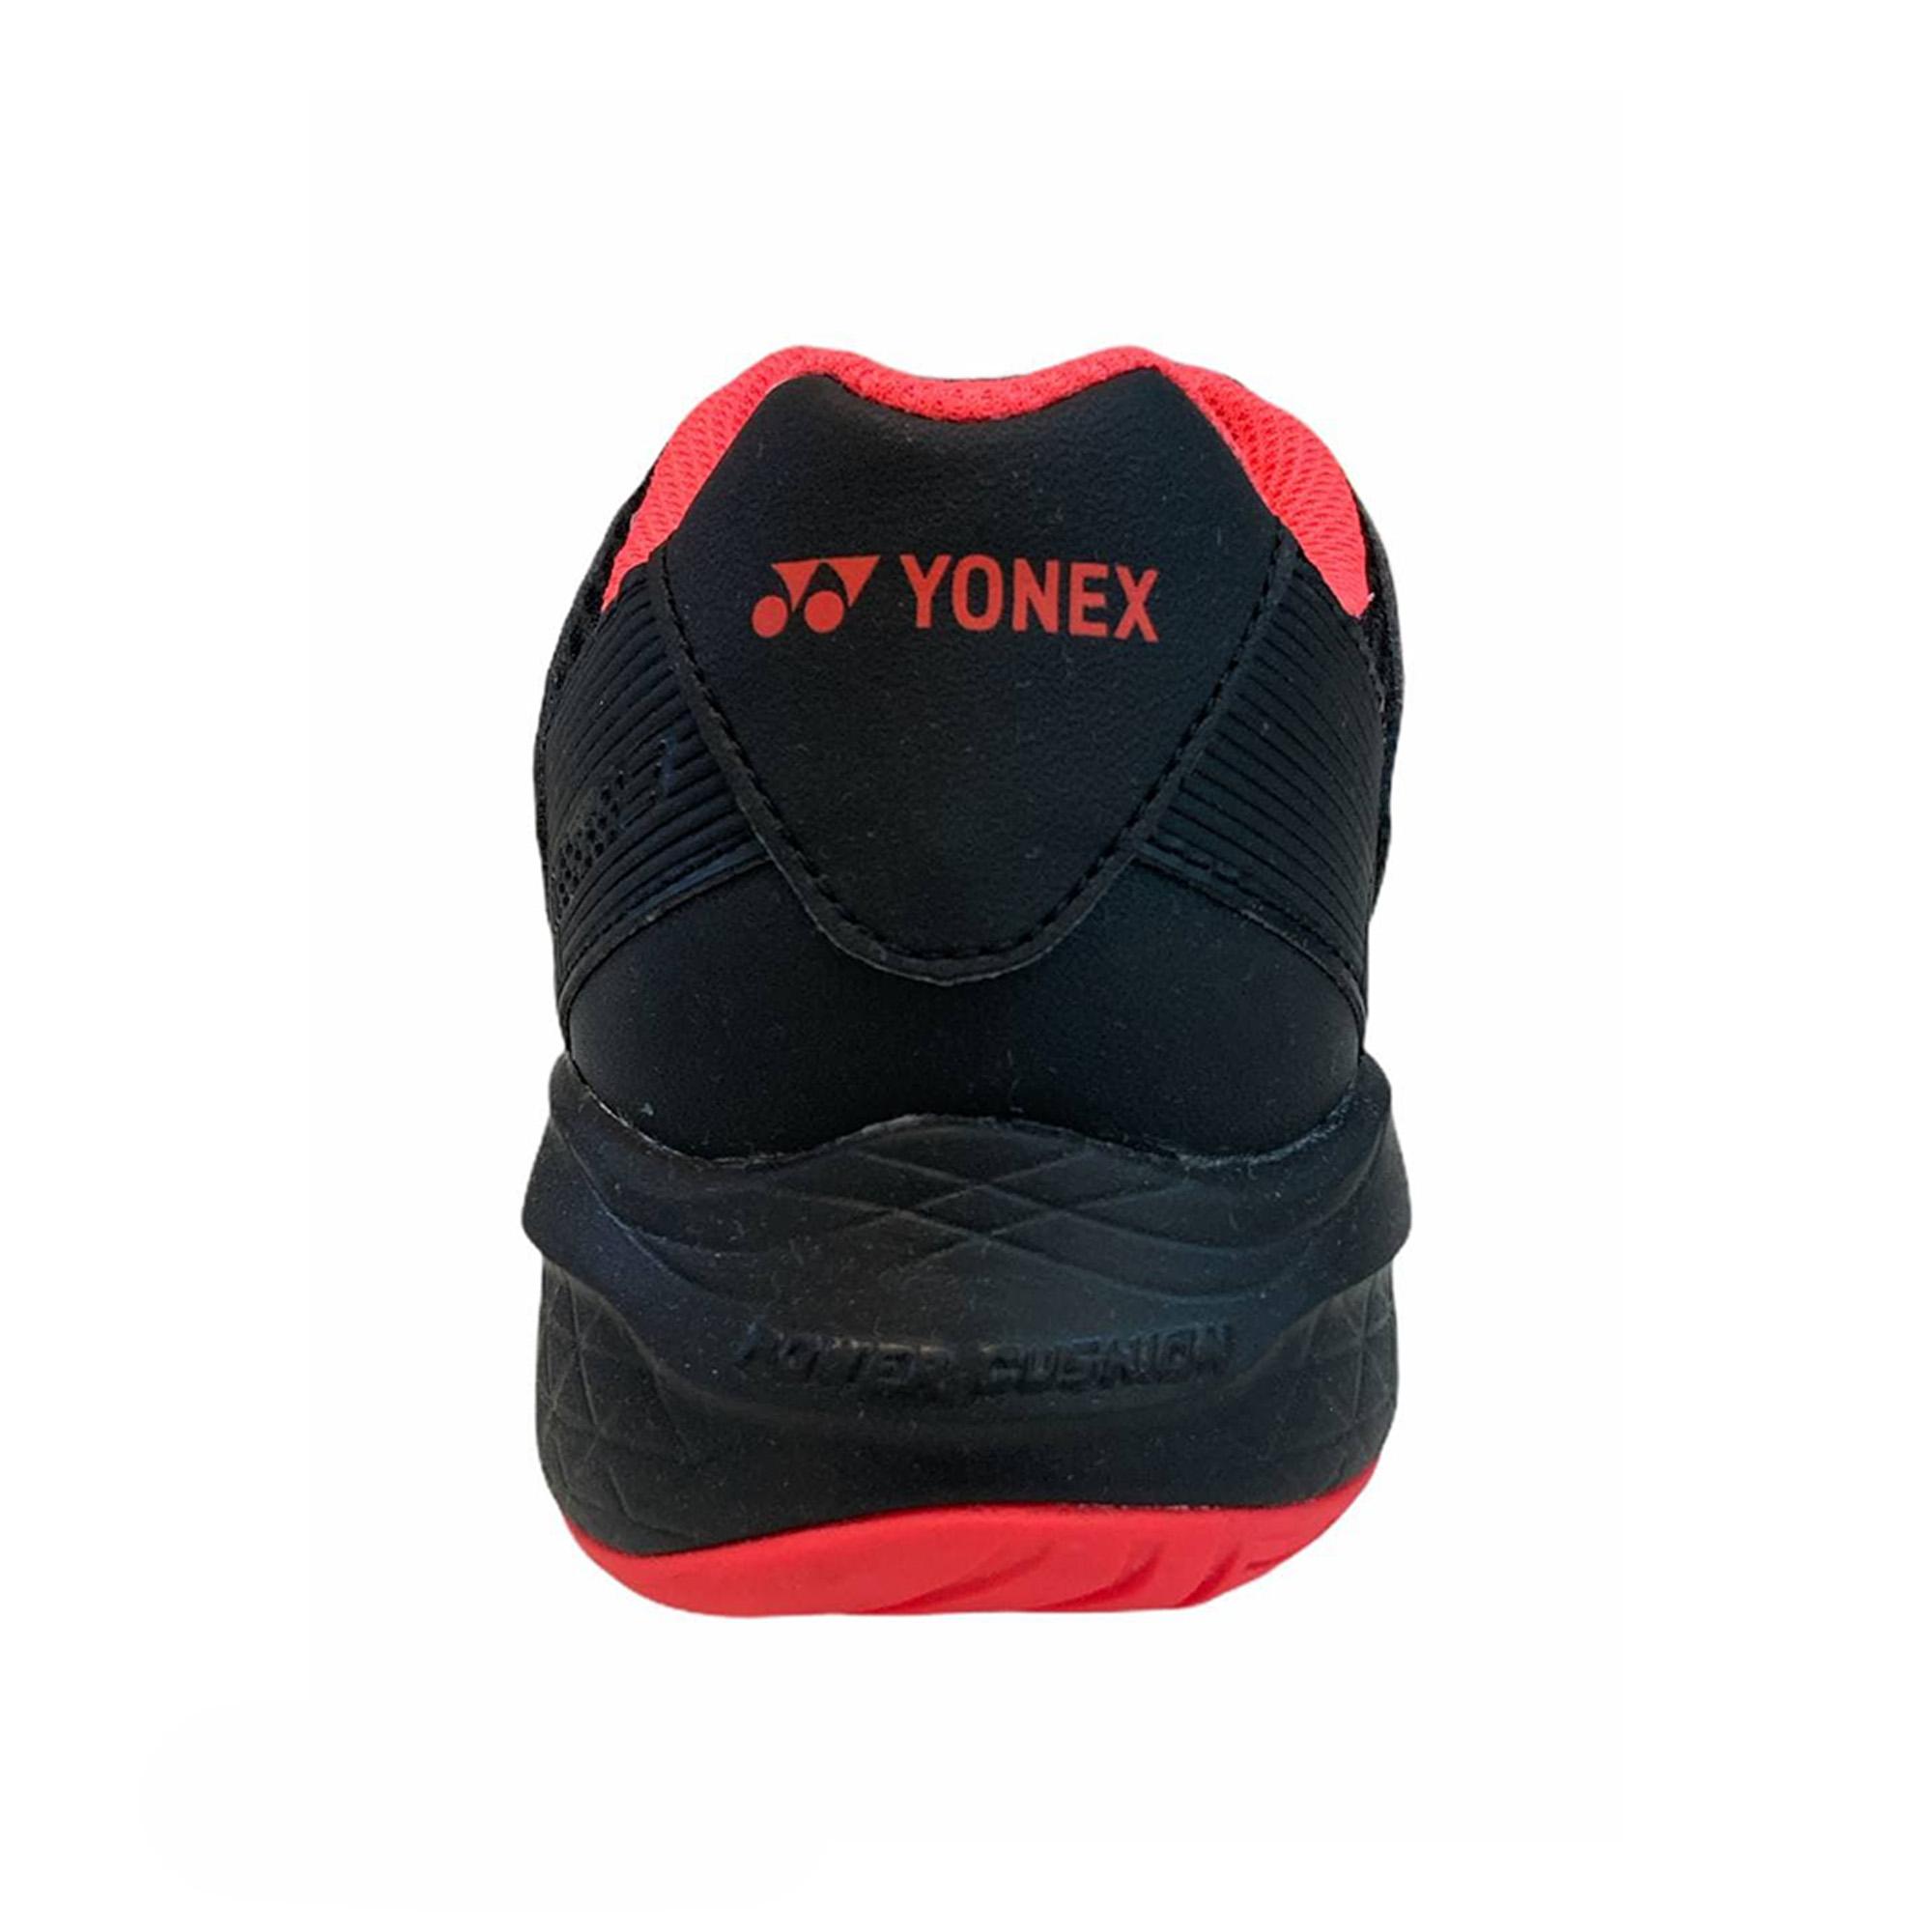 Tênis Yonex Power Cushion Lumio 2 - All Court